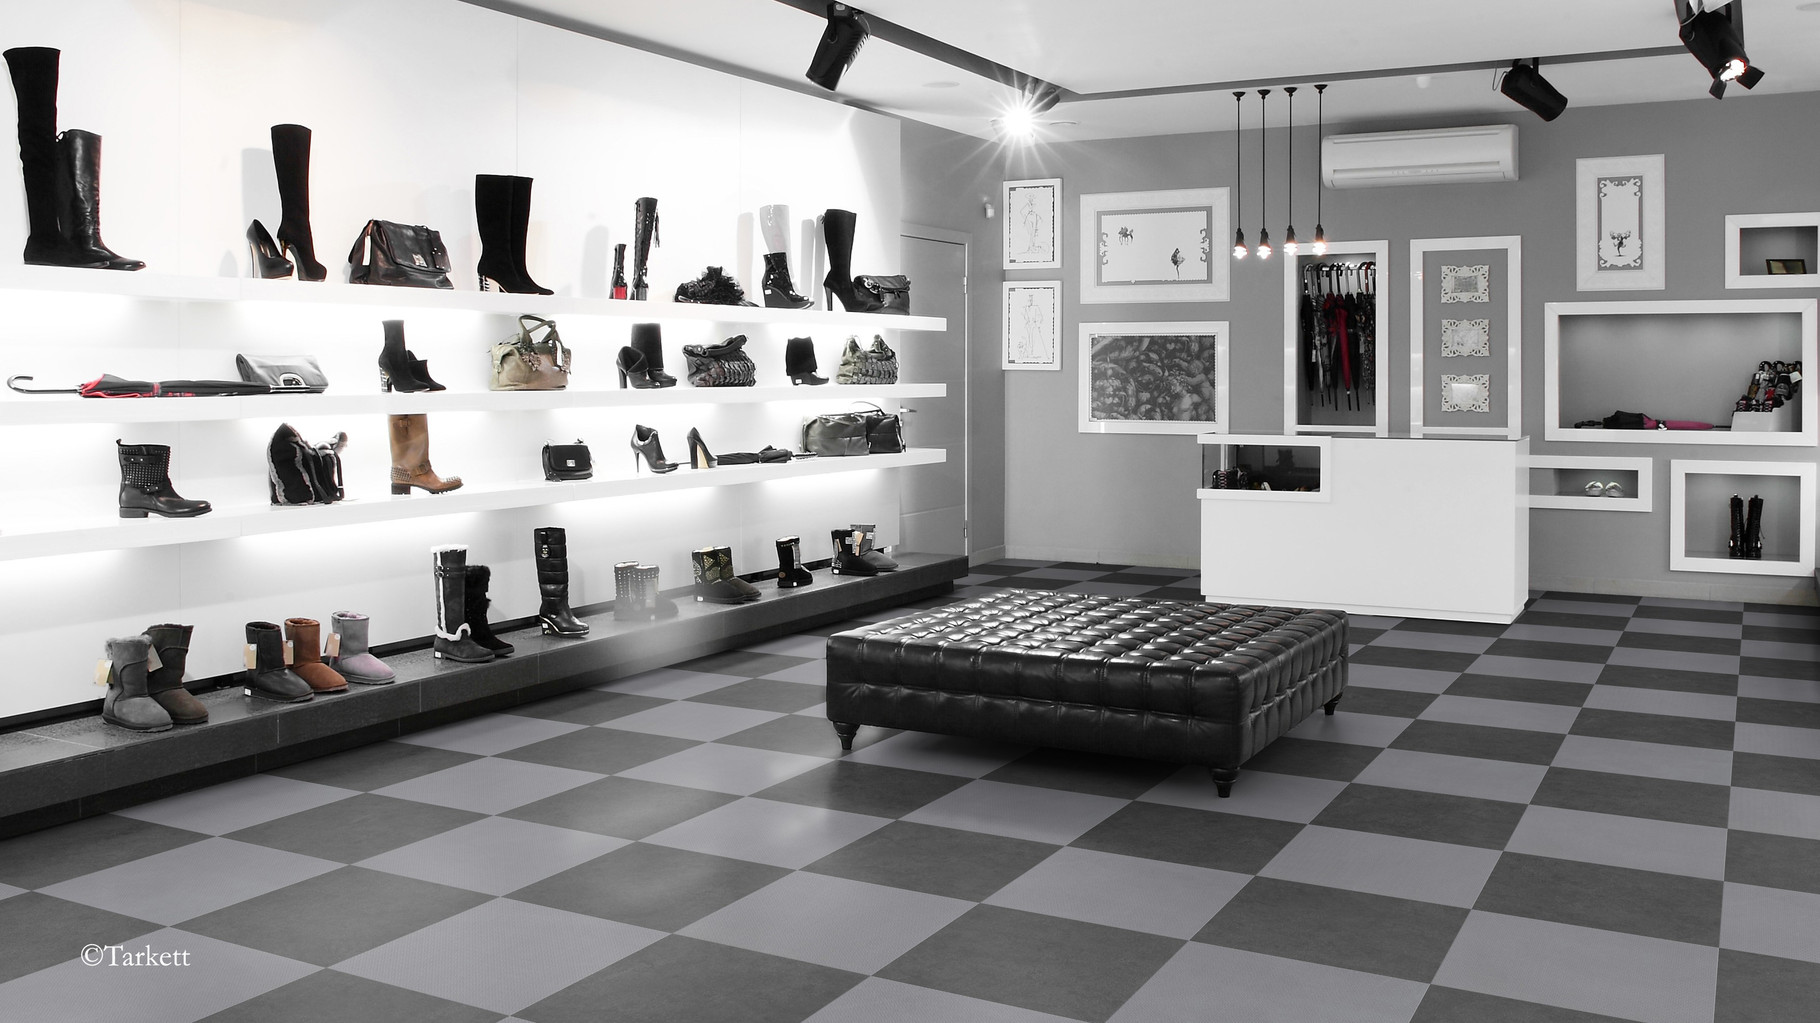 raumgestaltung rossat geiller gmbh raumgestaltung w rzburg. Black Bedroom Furniture Sets. Home Design Ideas